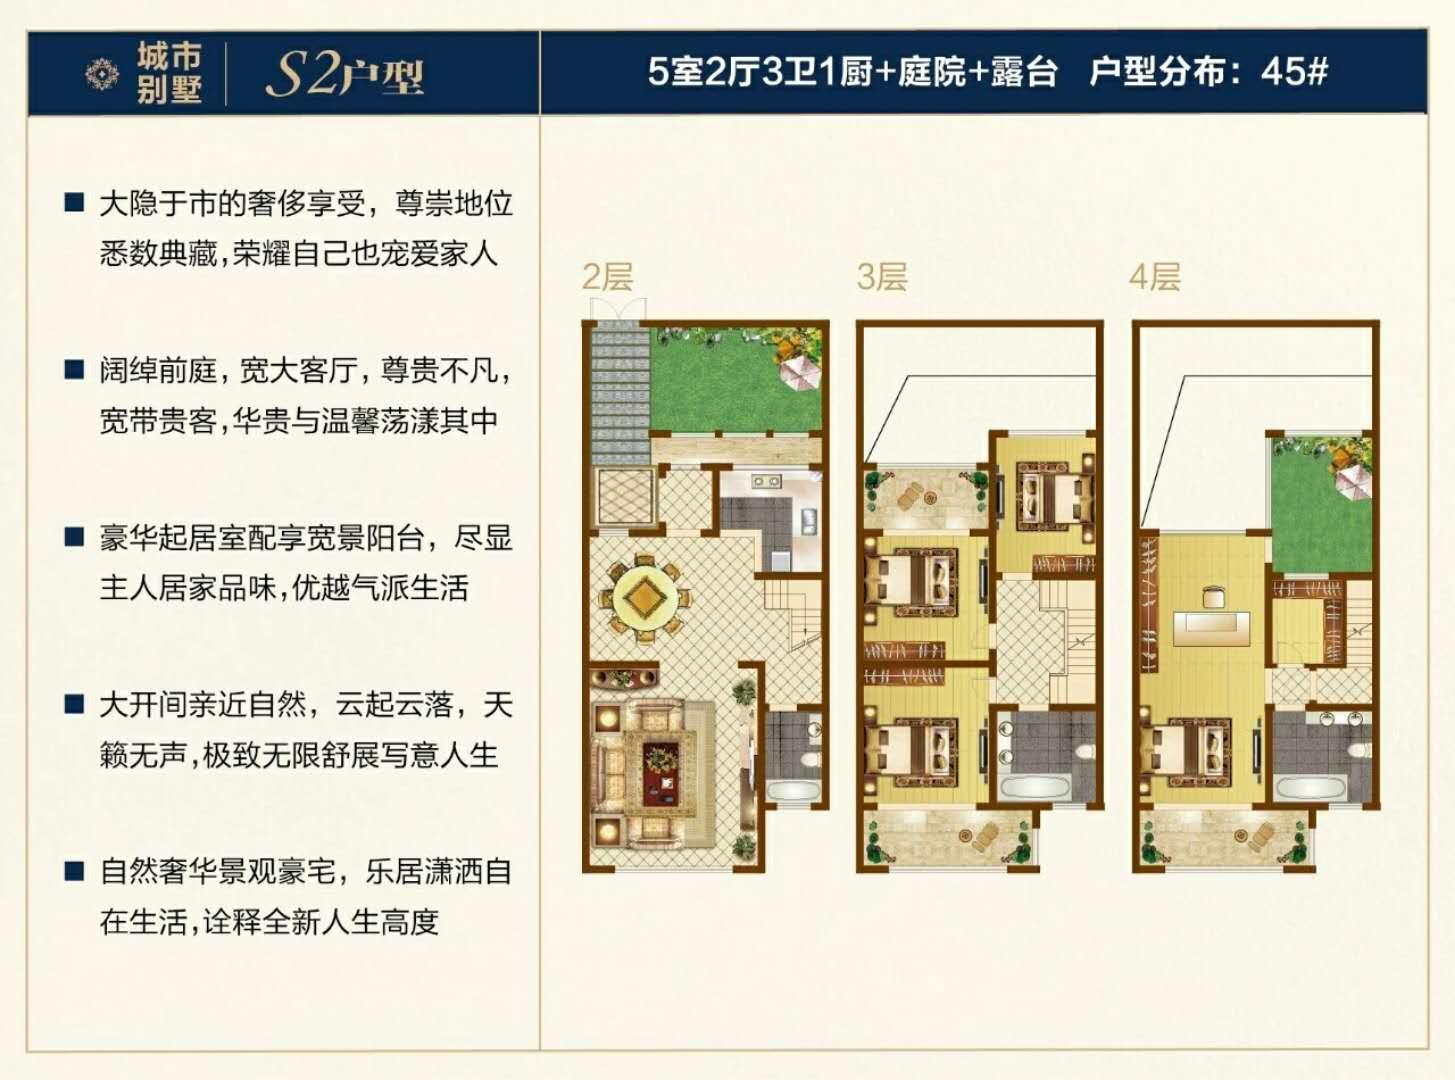 45#S2户型 5房2厅3卫